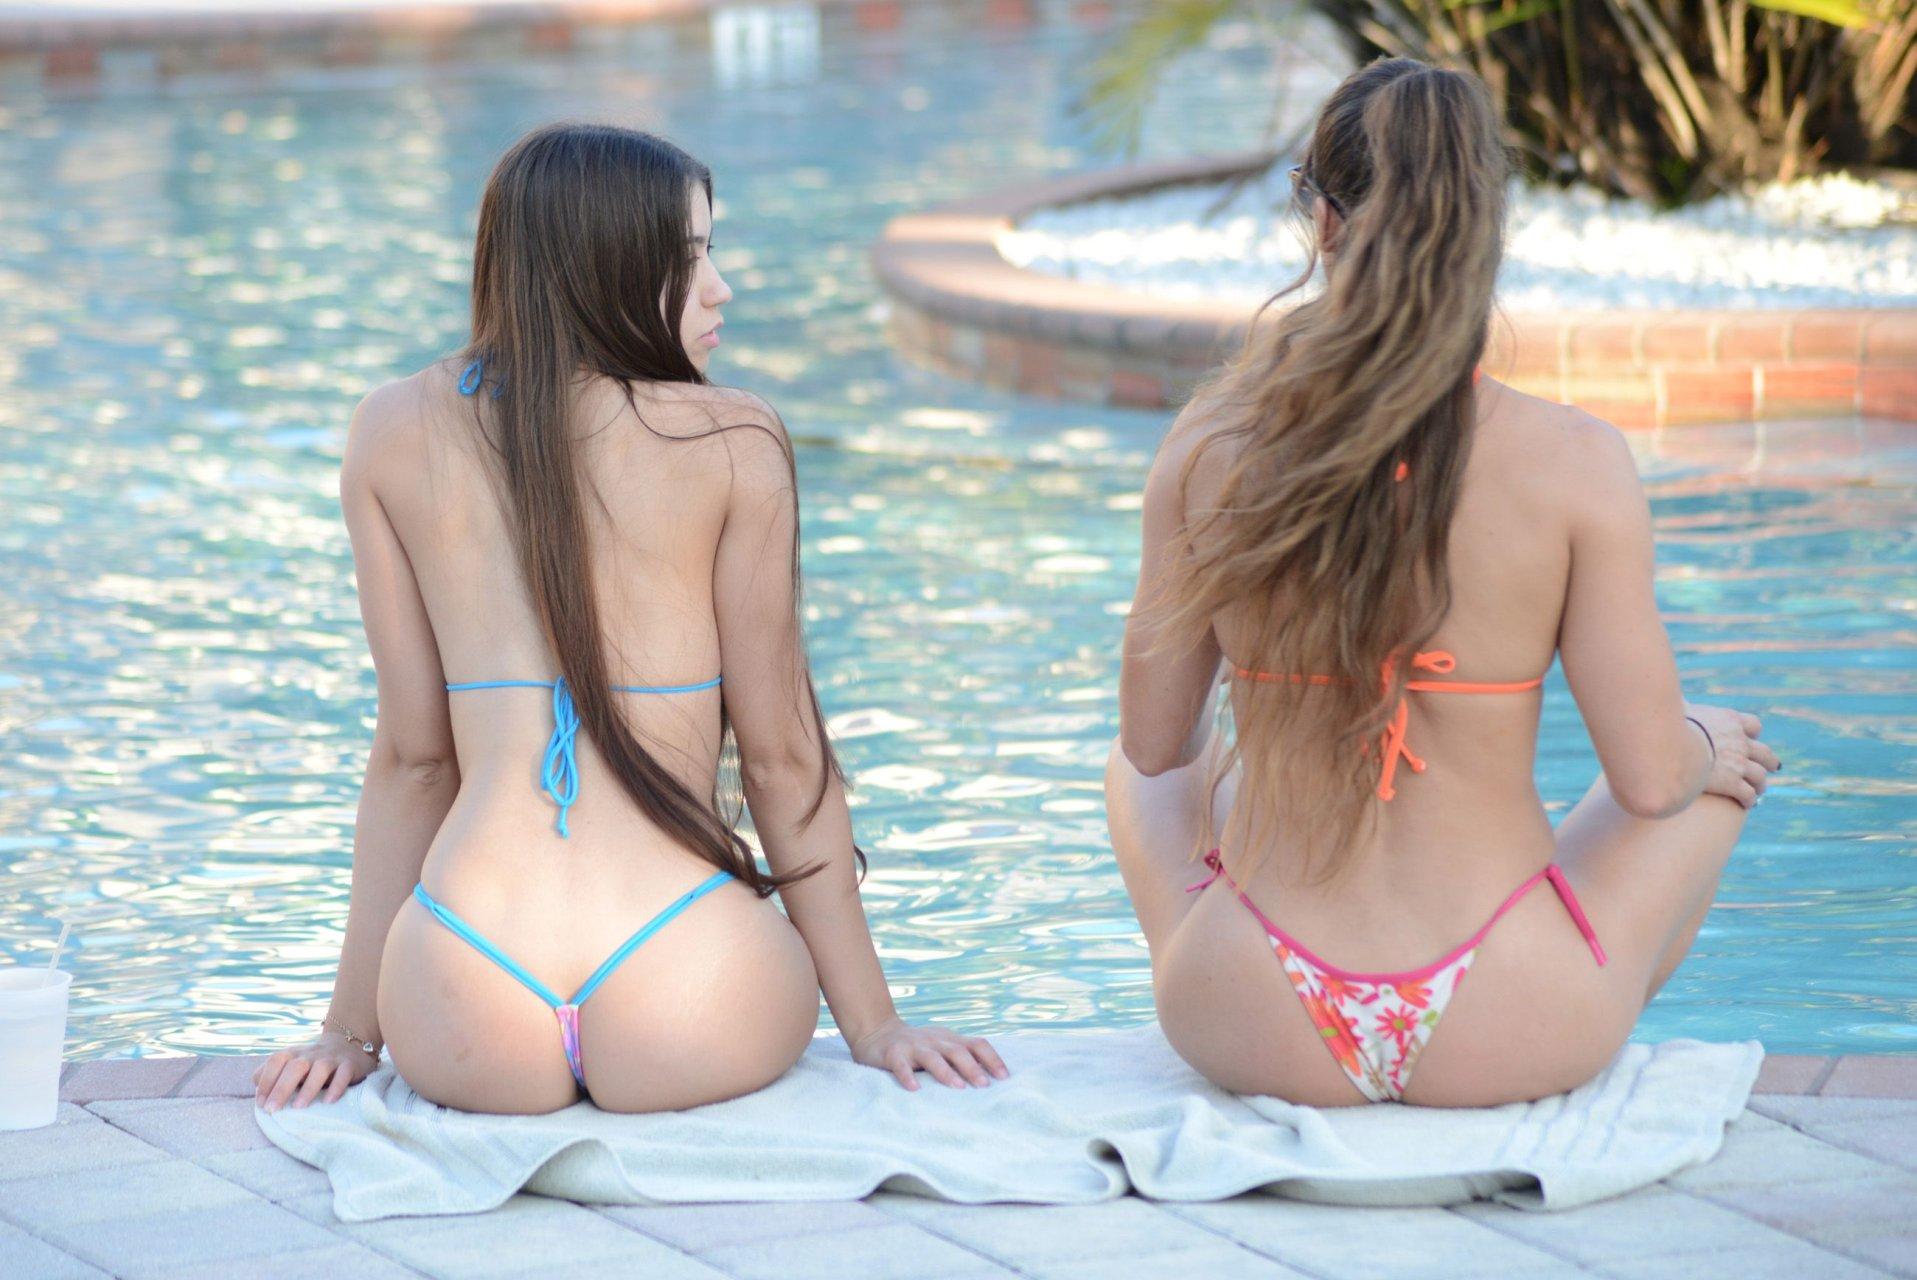 anais zanotti nicole caridad sexy topless photos